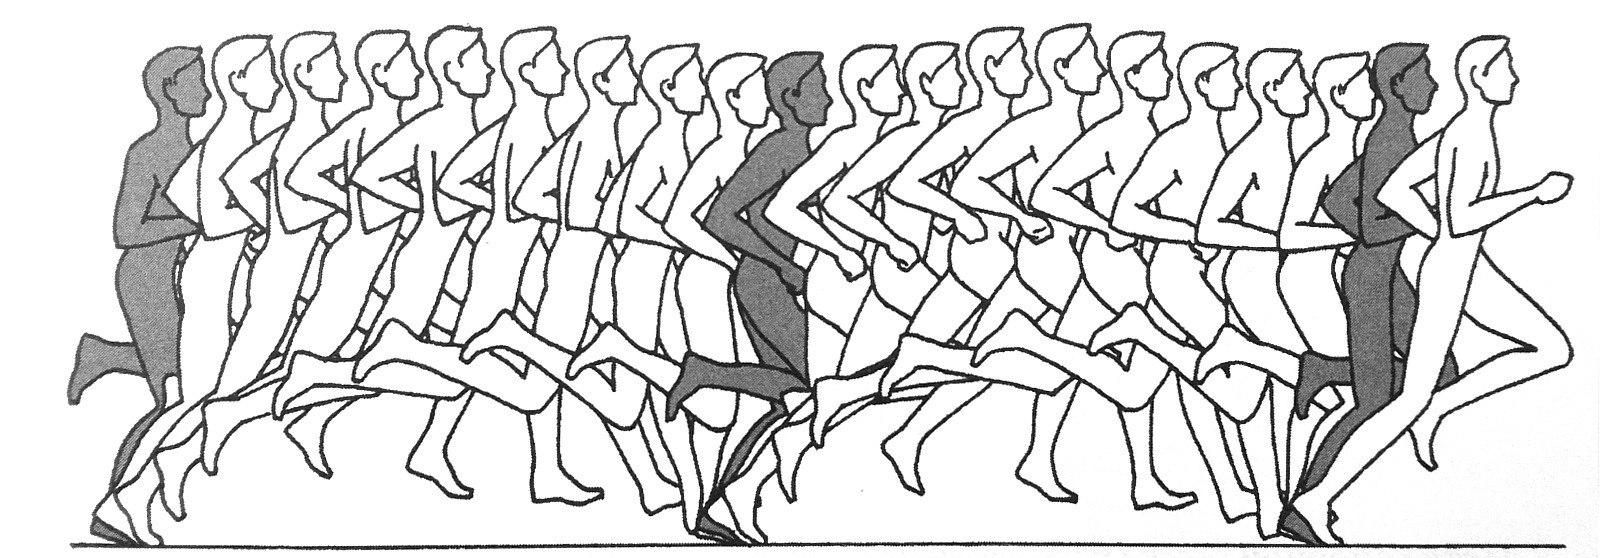 беговой шаг спортсмена